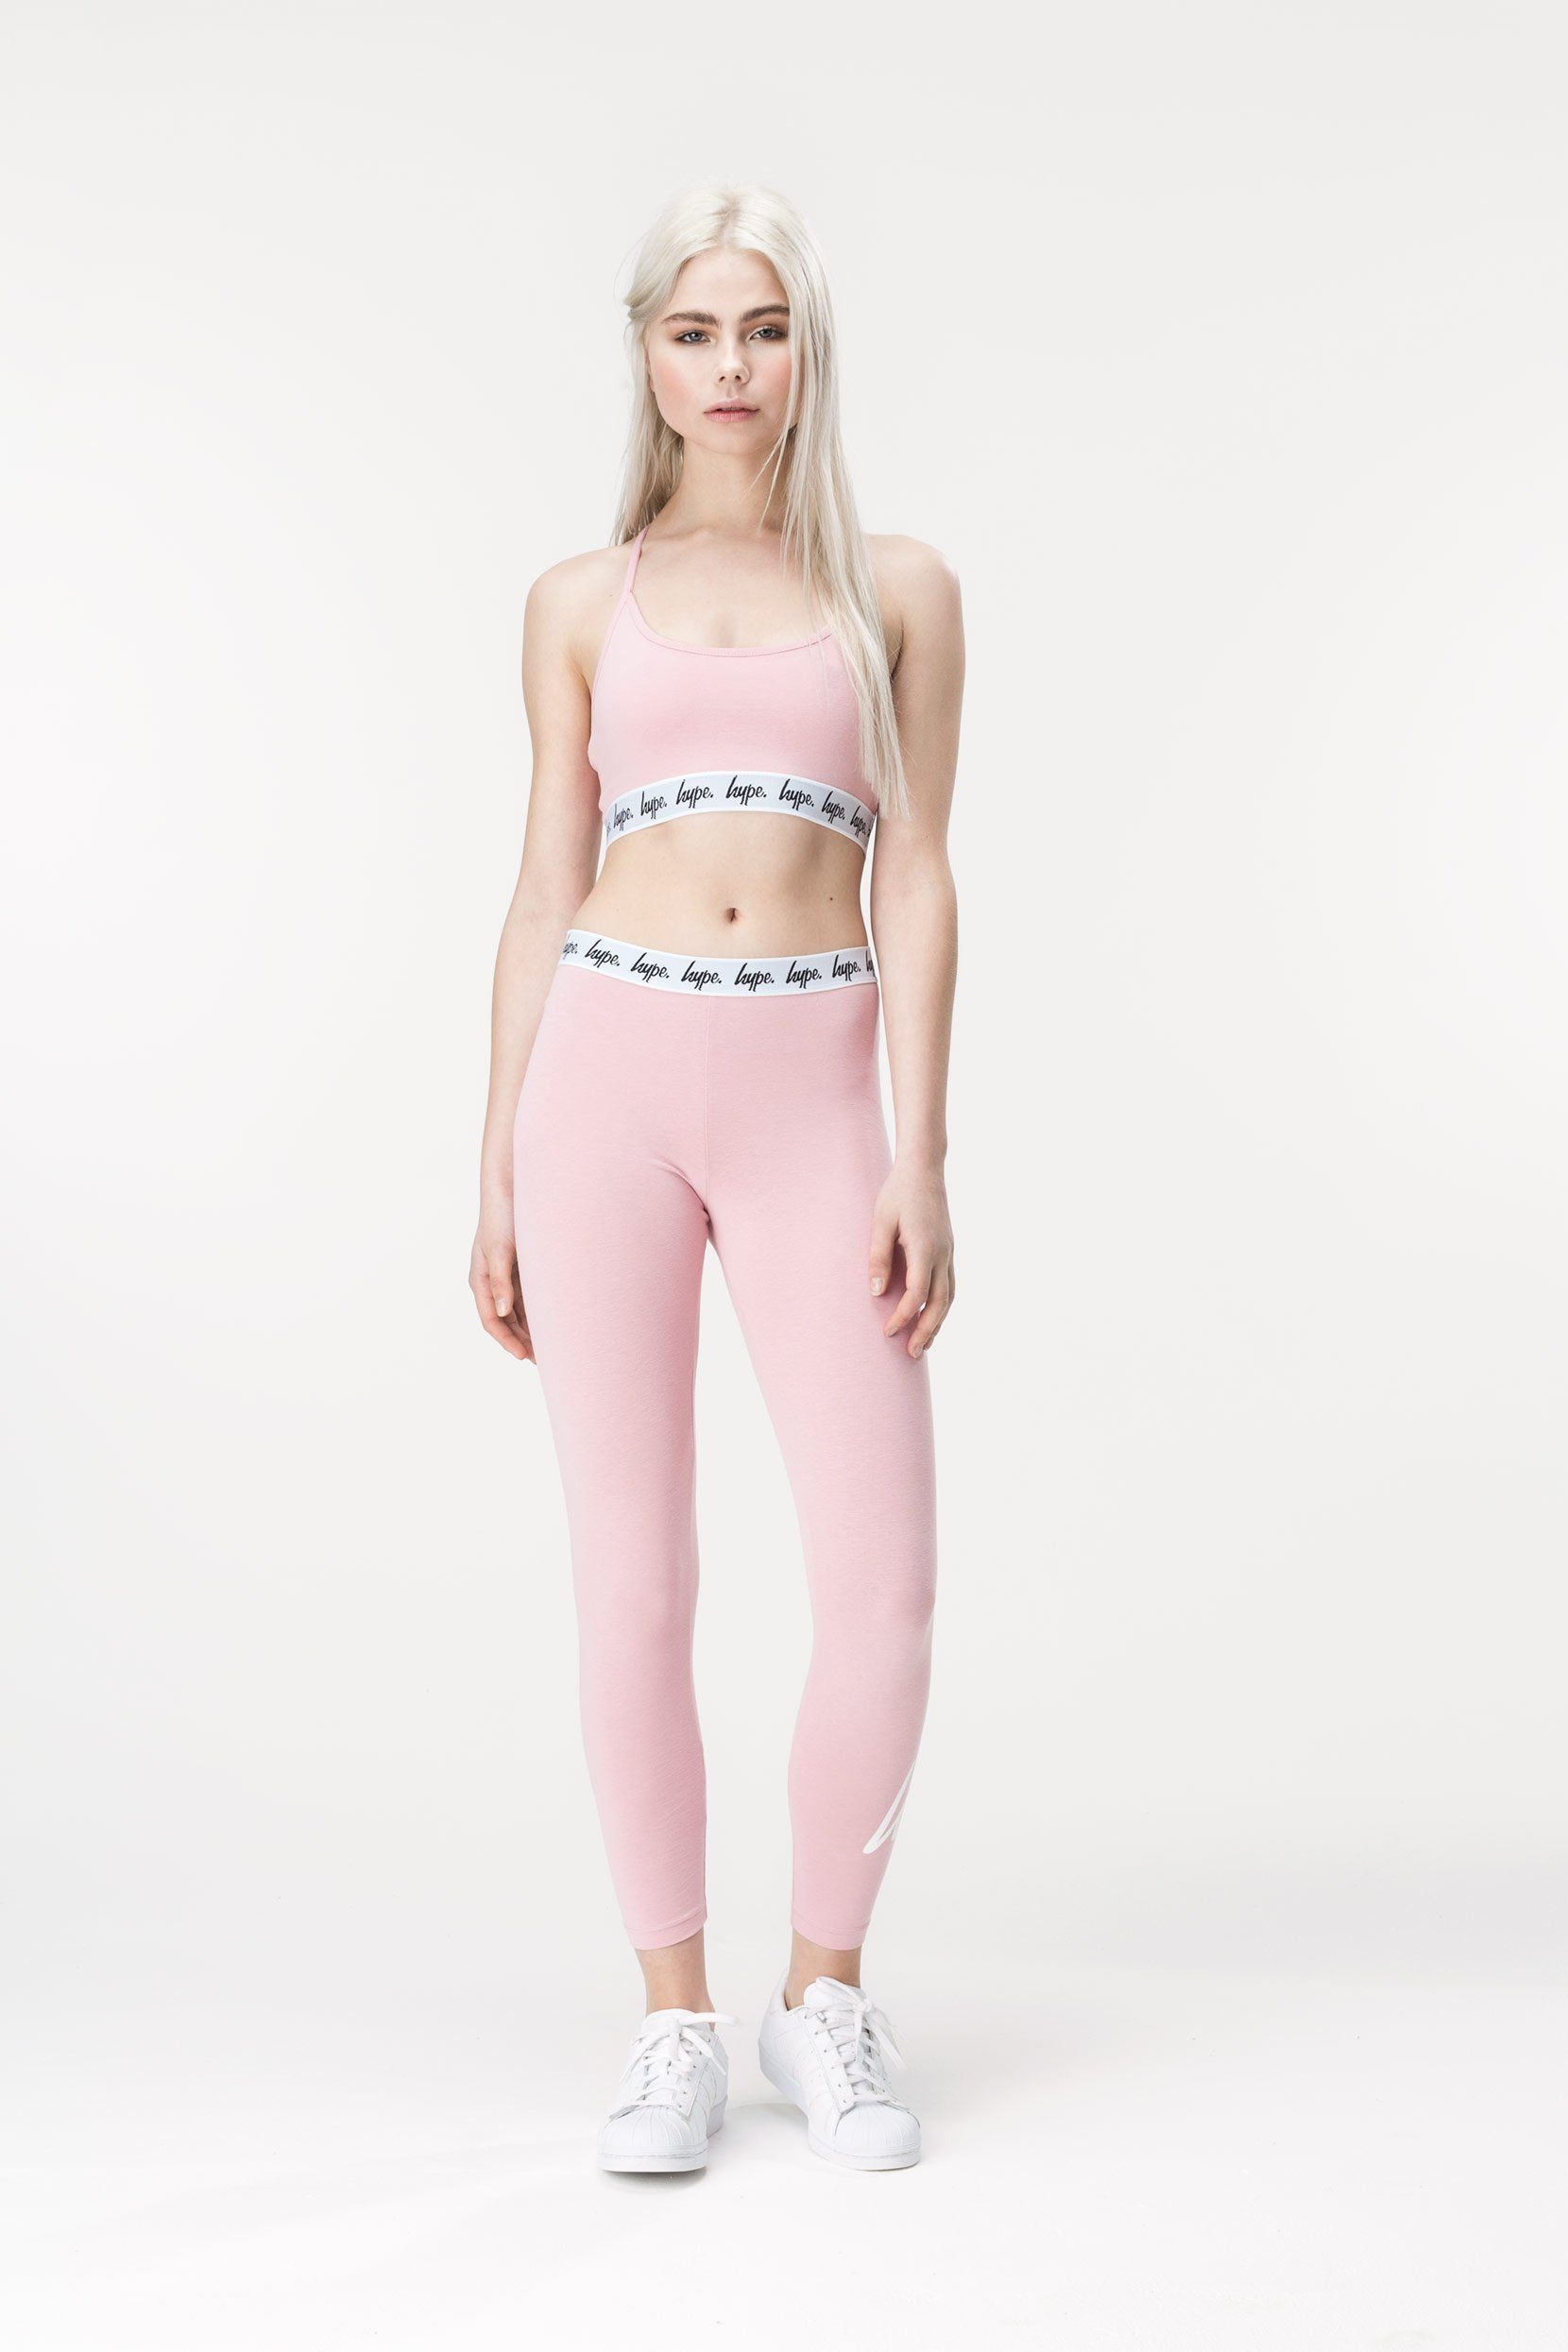 HYPE Pink Taped Women's Bralet